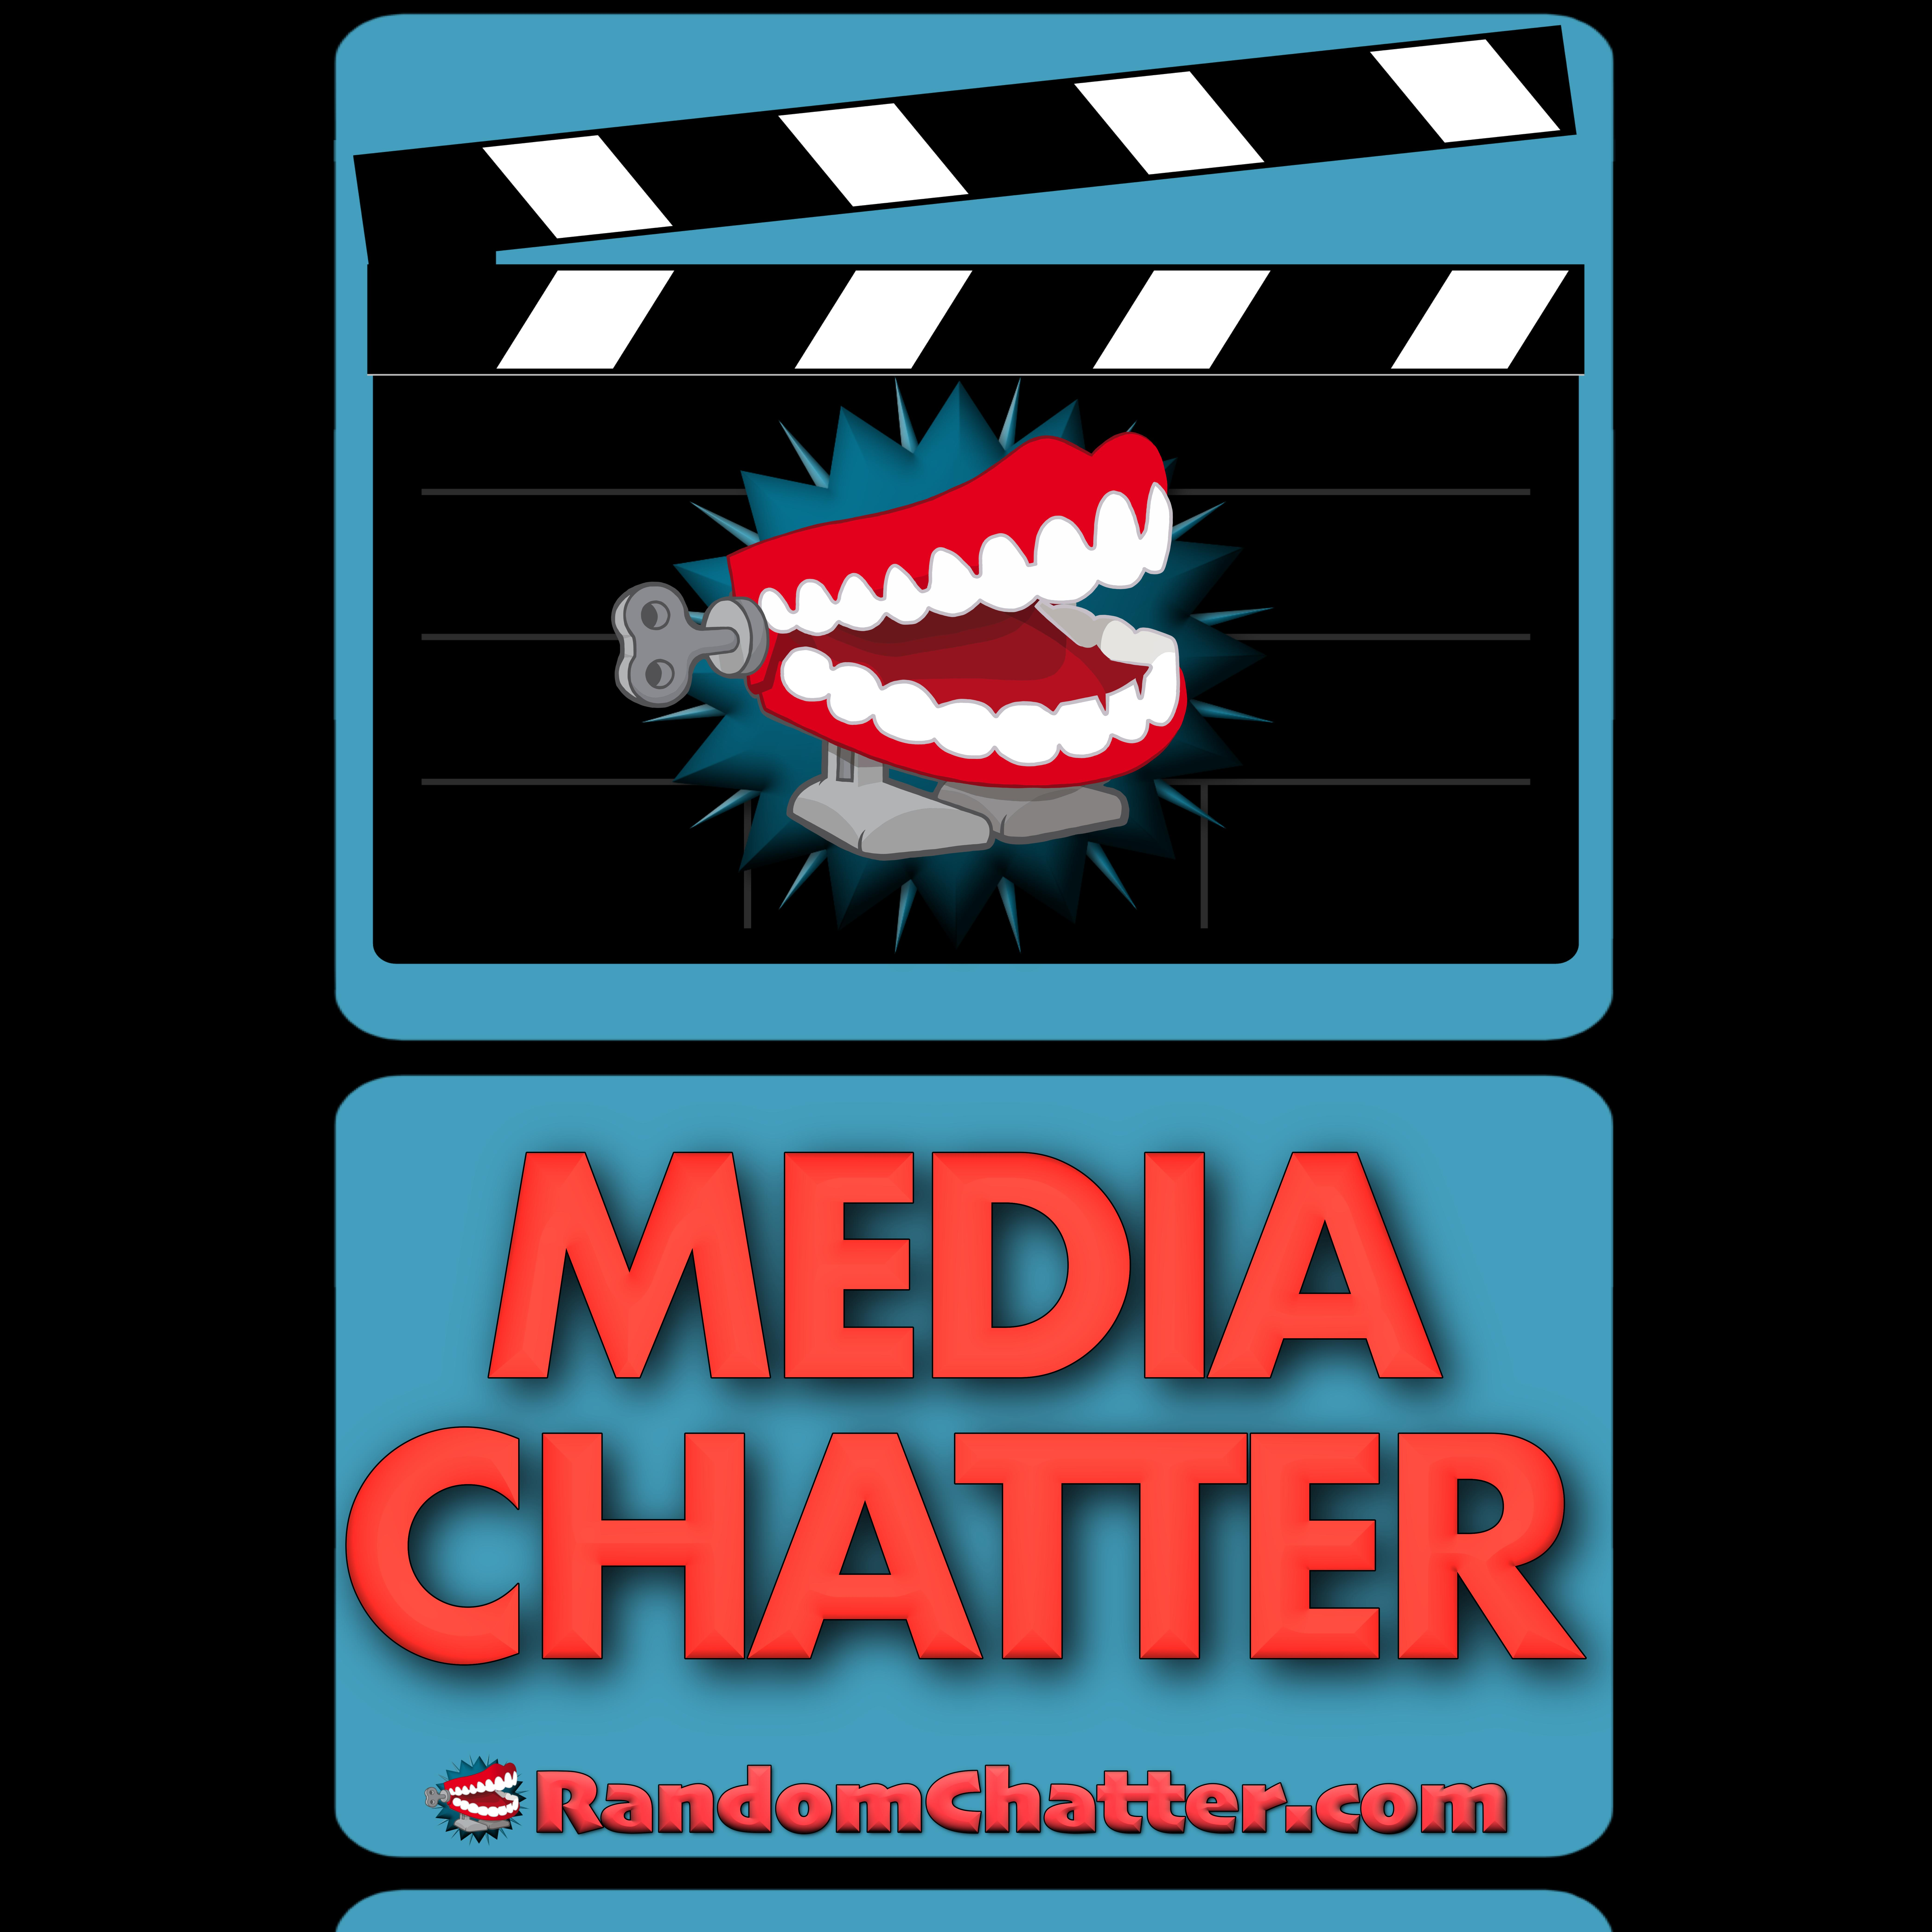 MovieChatter